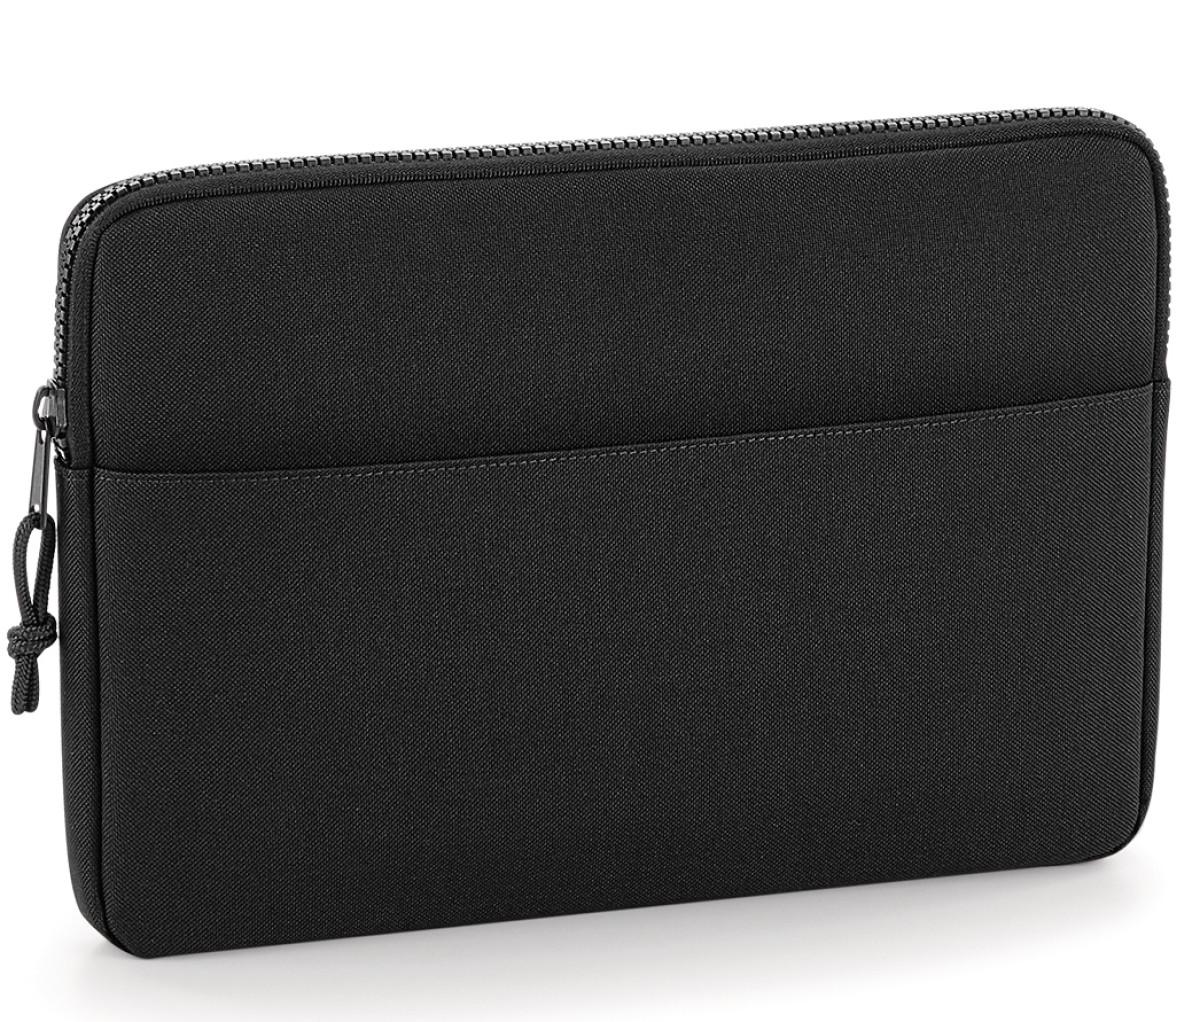 "Bagbase Essential 15"" Laptop Case"